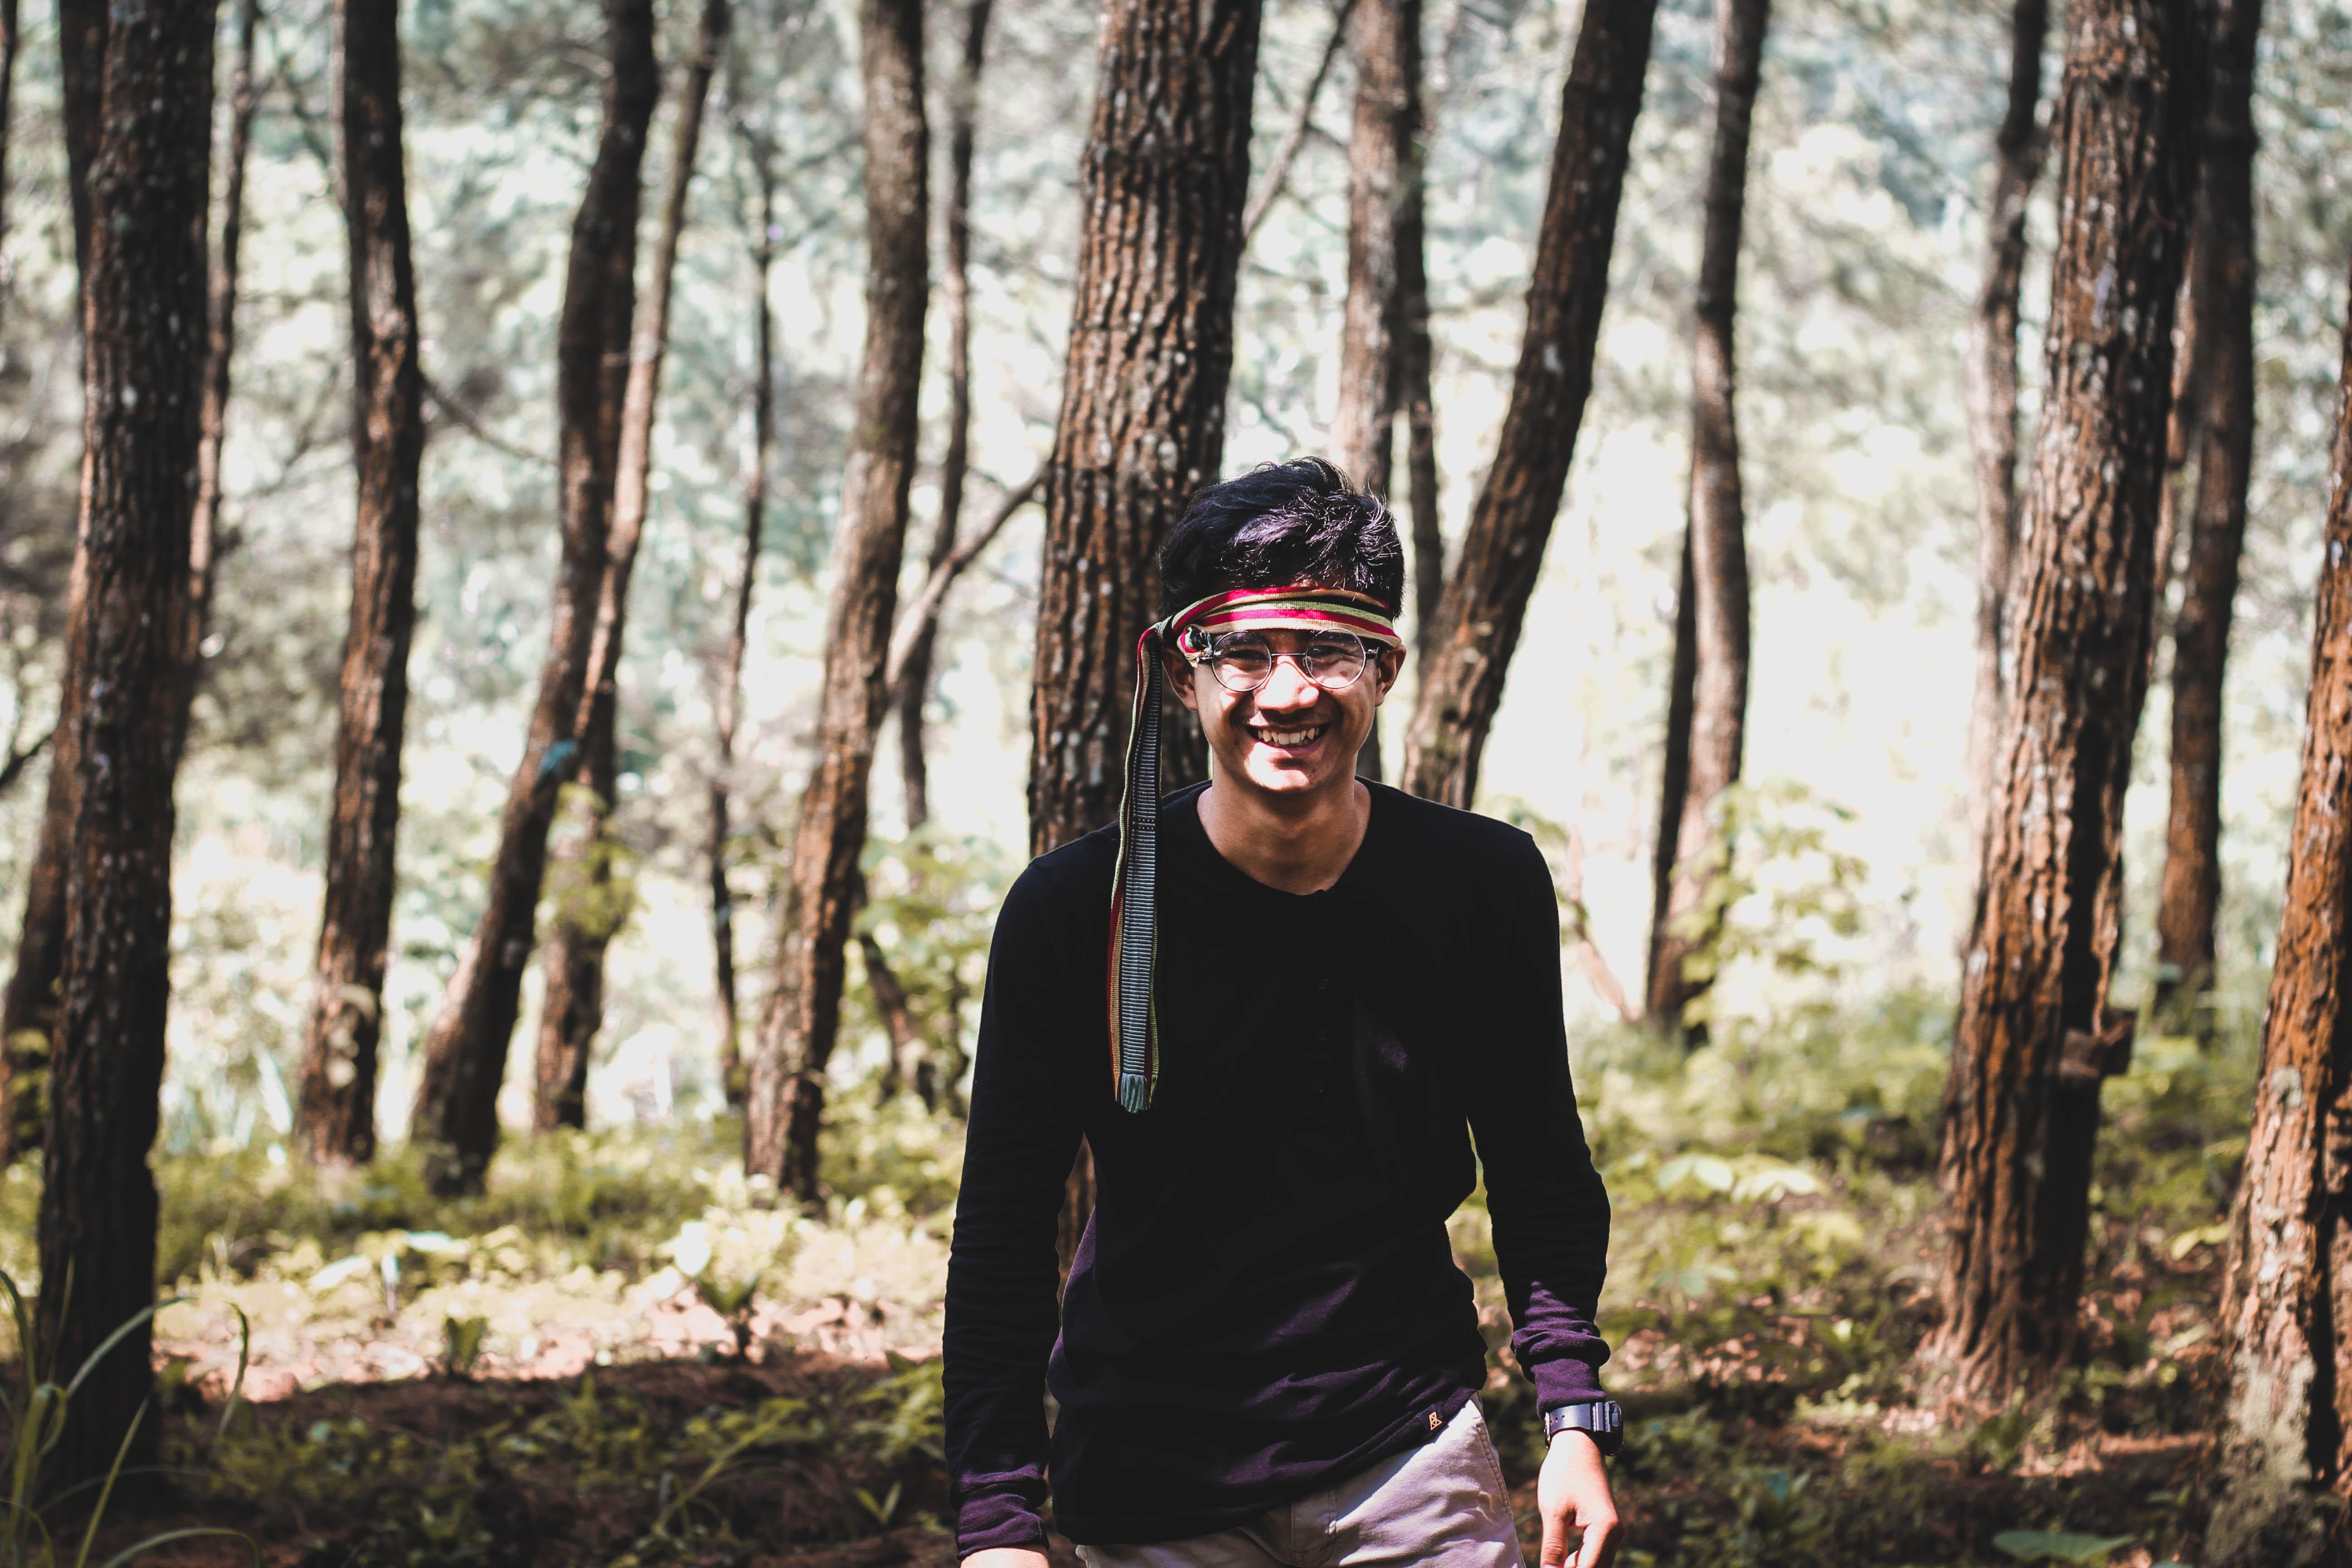 man wearing black shirt walking inside forest